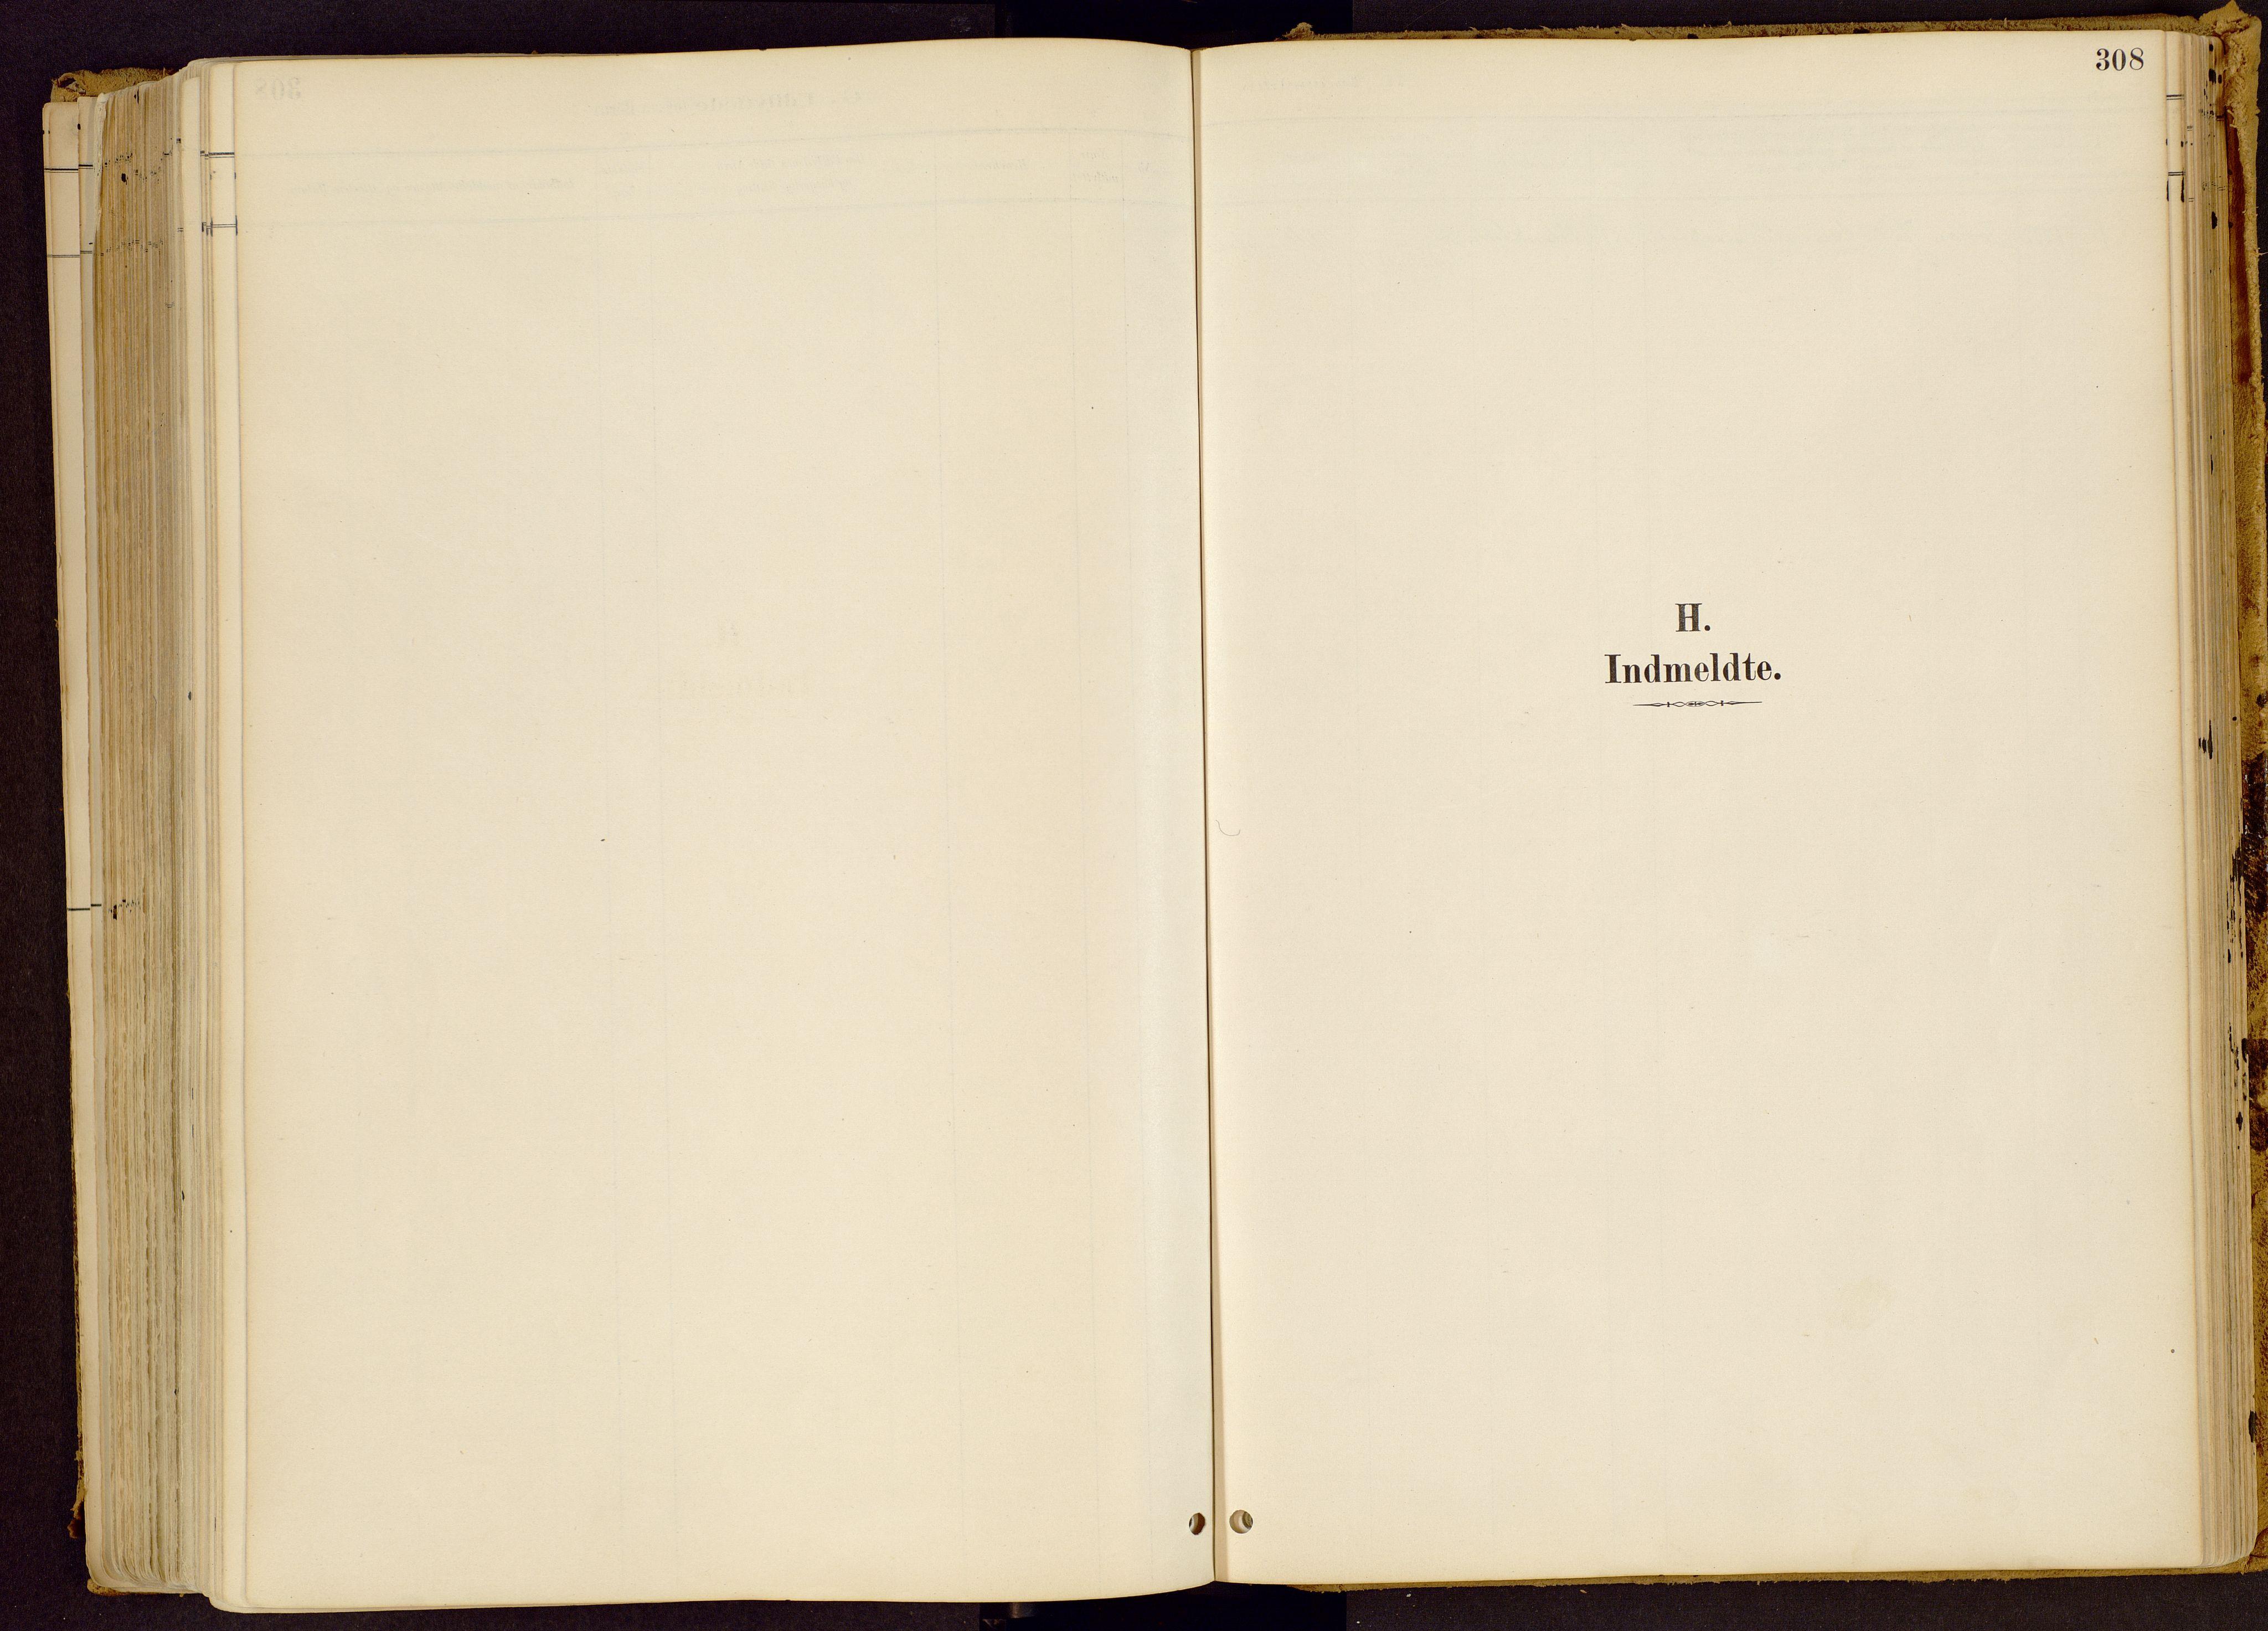 SAH, Vestre Gausdal prestekontor, Ministerialbok nr. 1, 1887-1914, s. 308